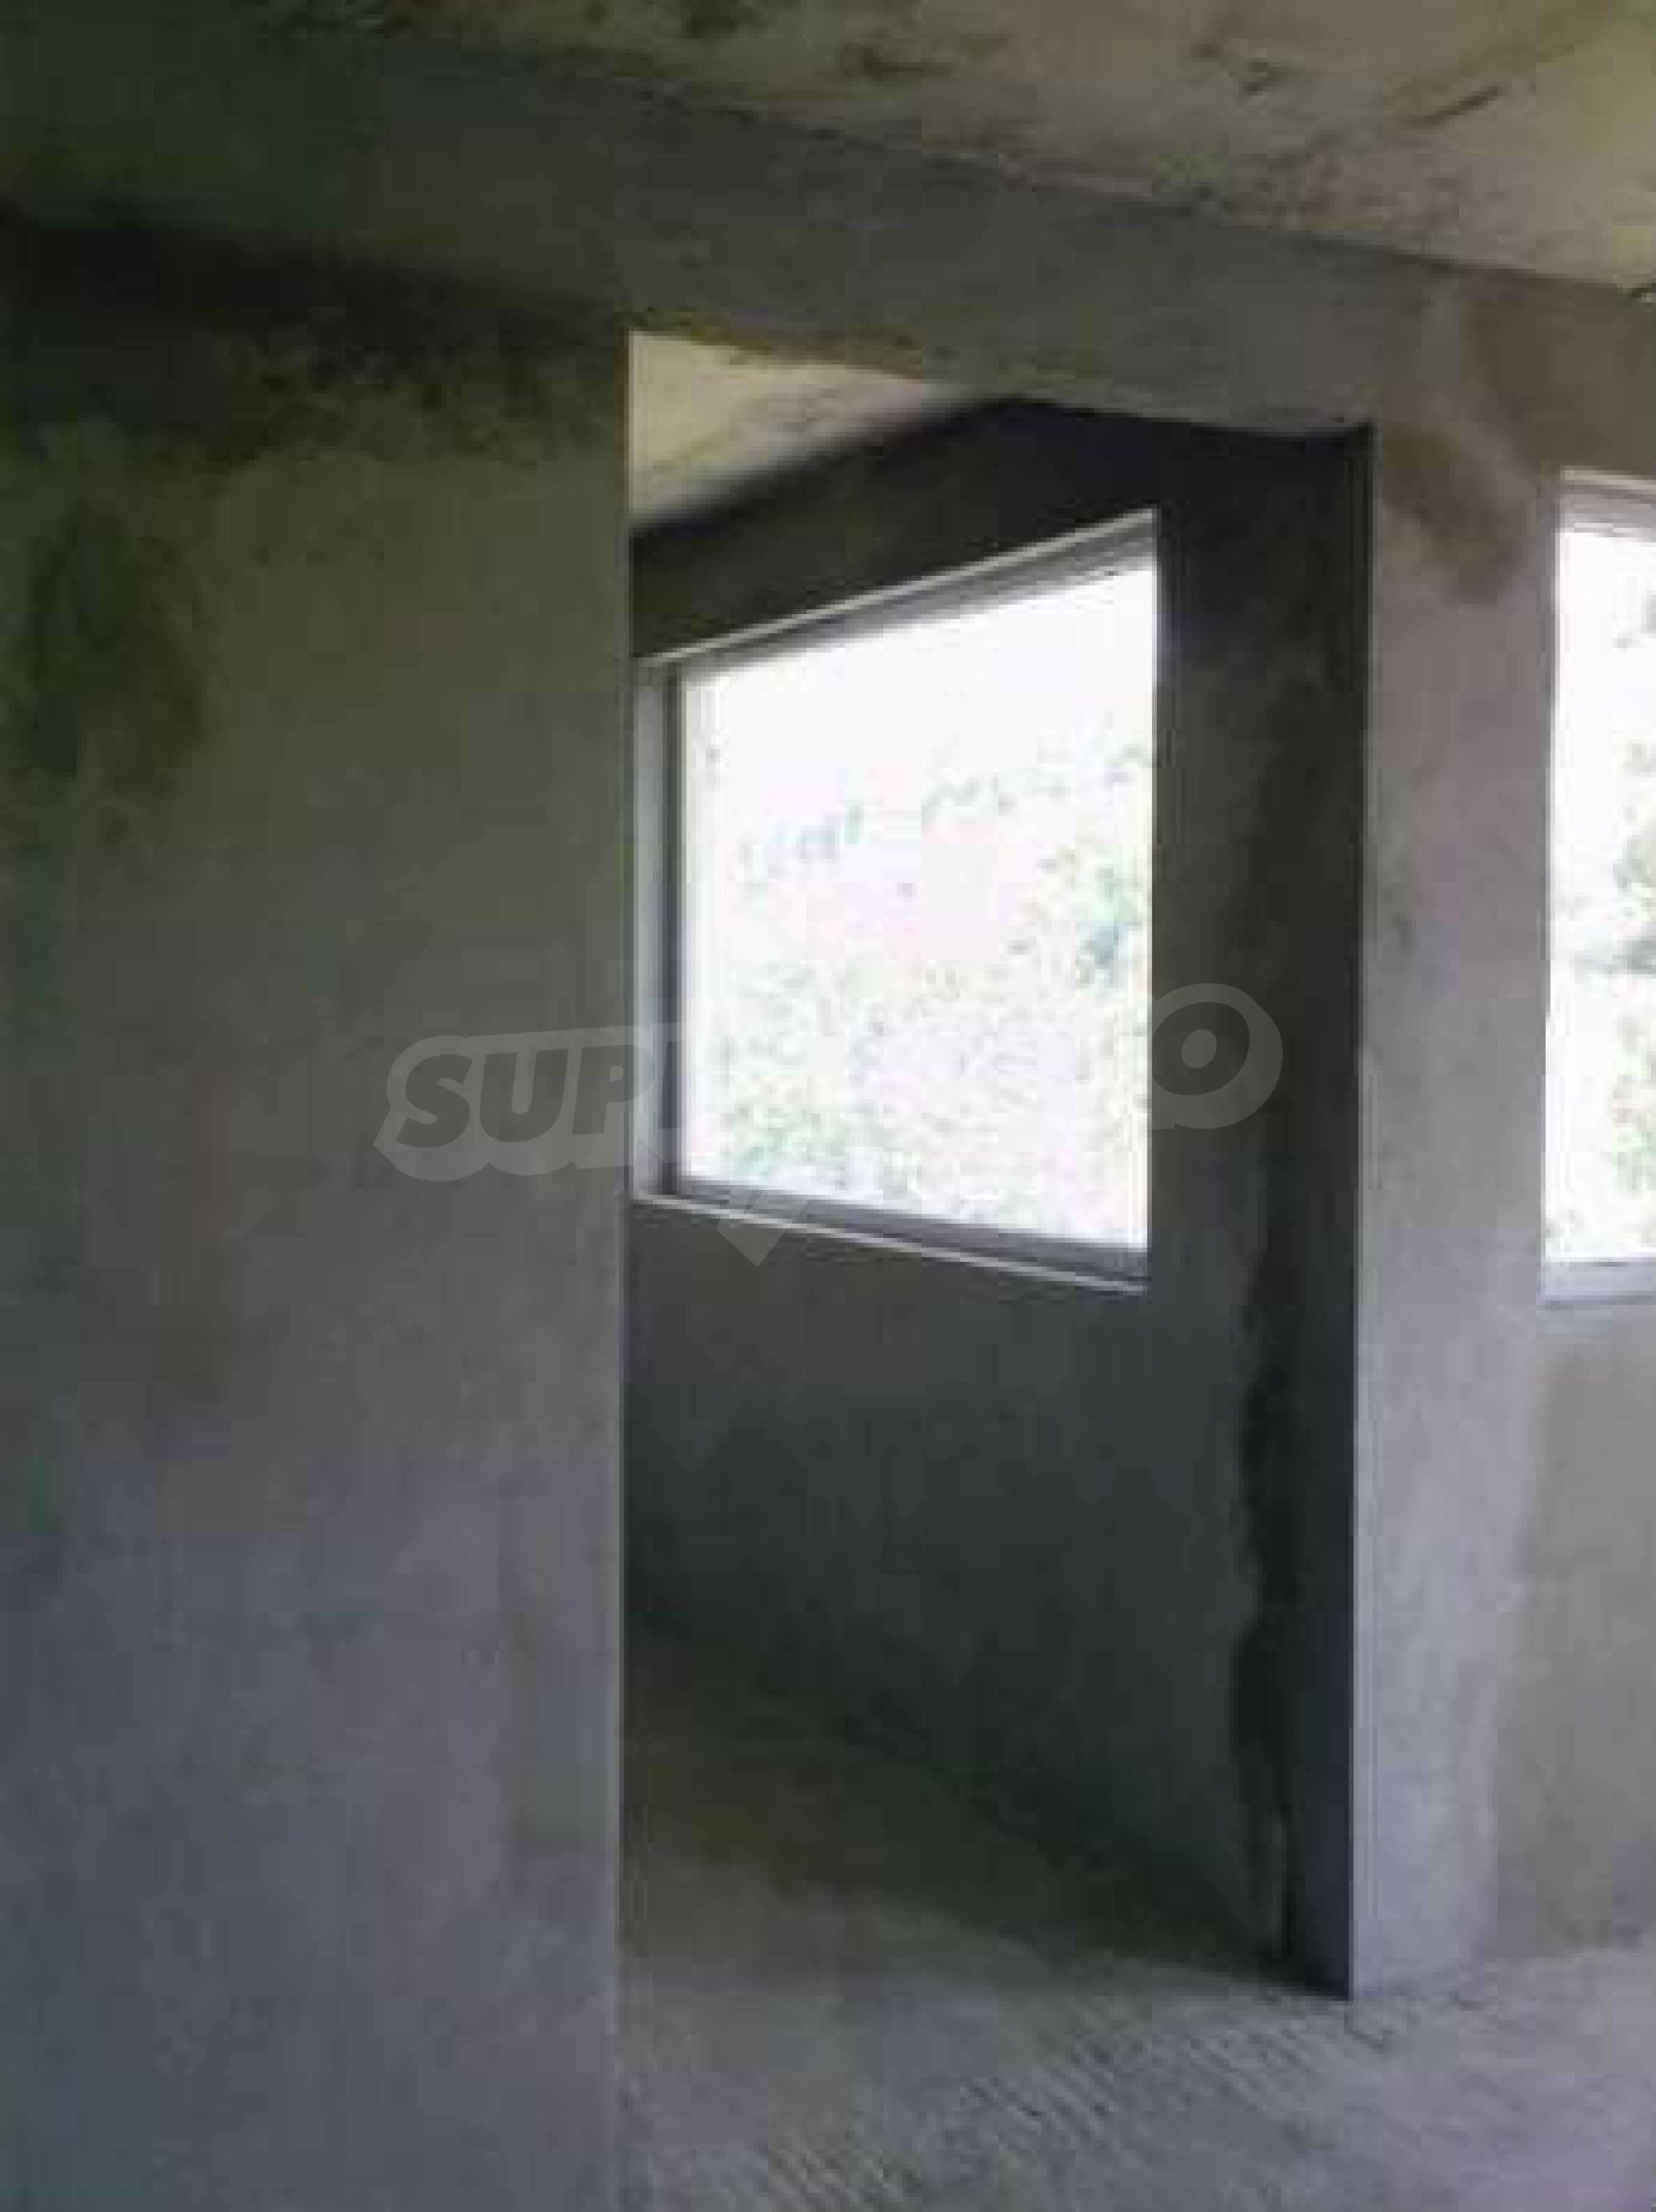 Новопостроена двуетажна къща в квартал на град Габрово 9